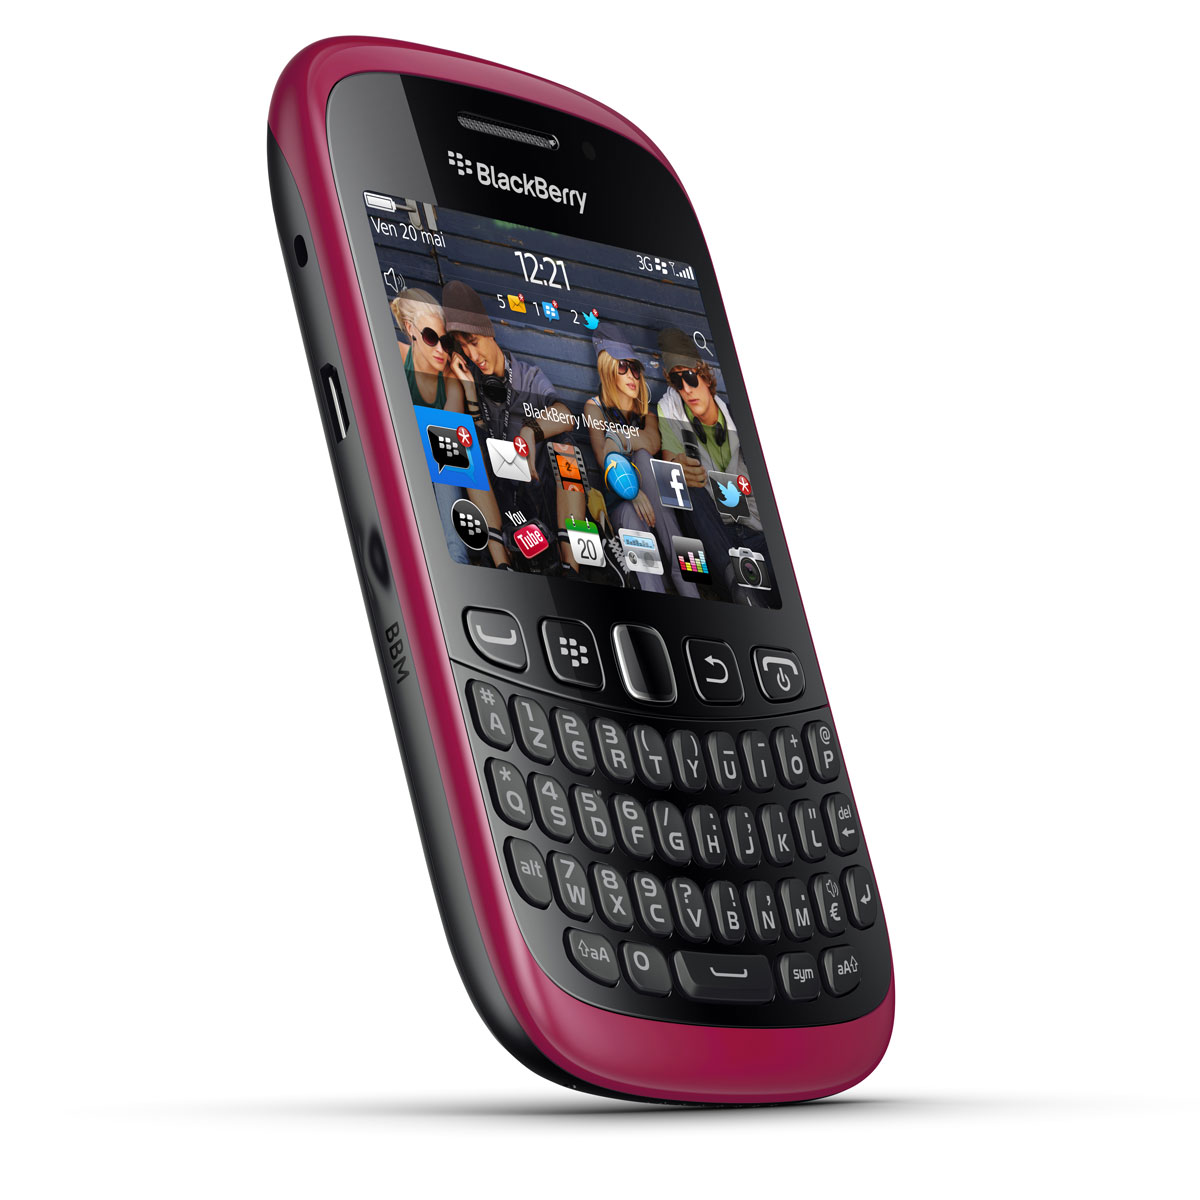 blackberry curve 9320 azerty rose mobile smartphone blackberry sur. Black Bedroom Furniture Sets. Home Design Ideas